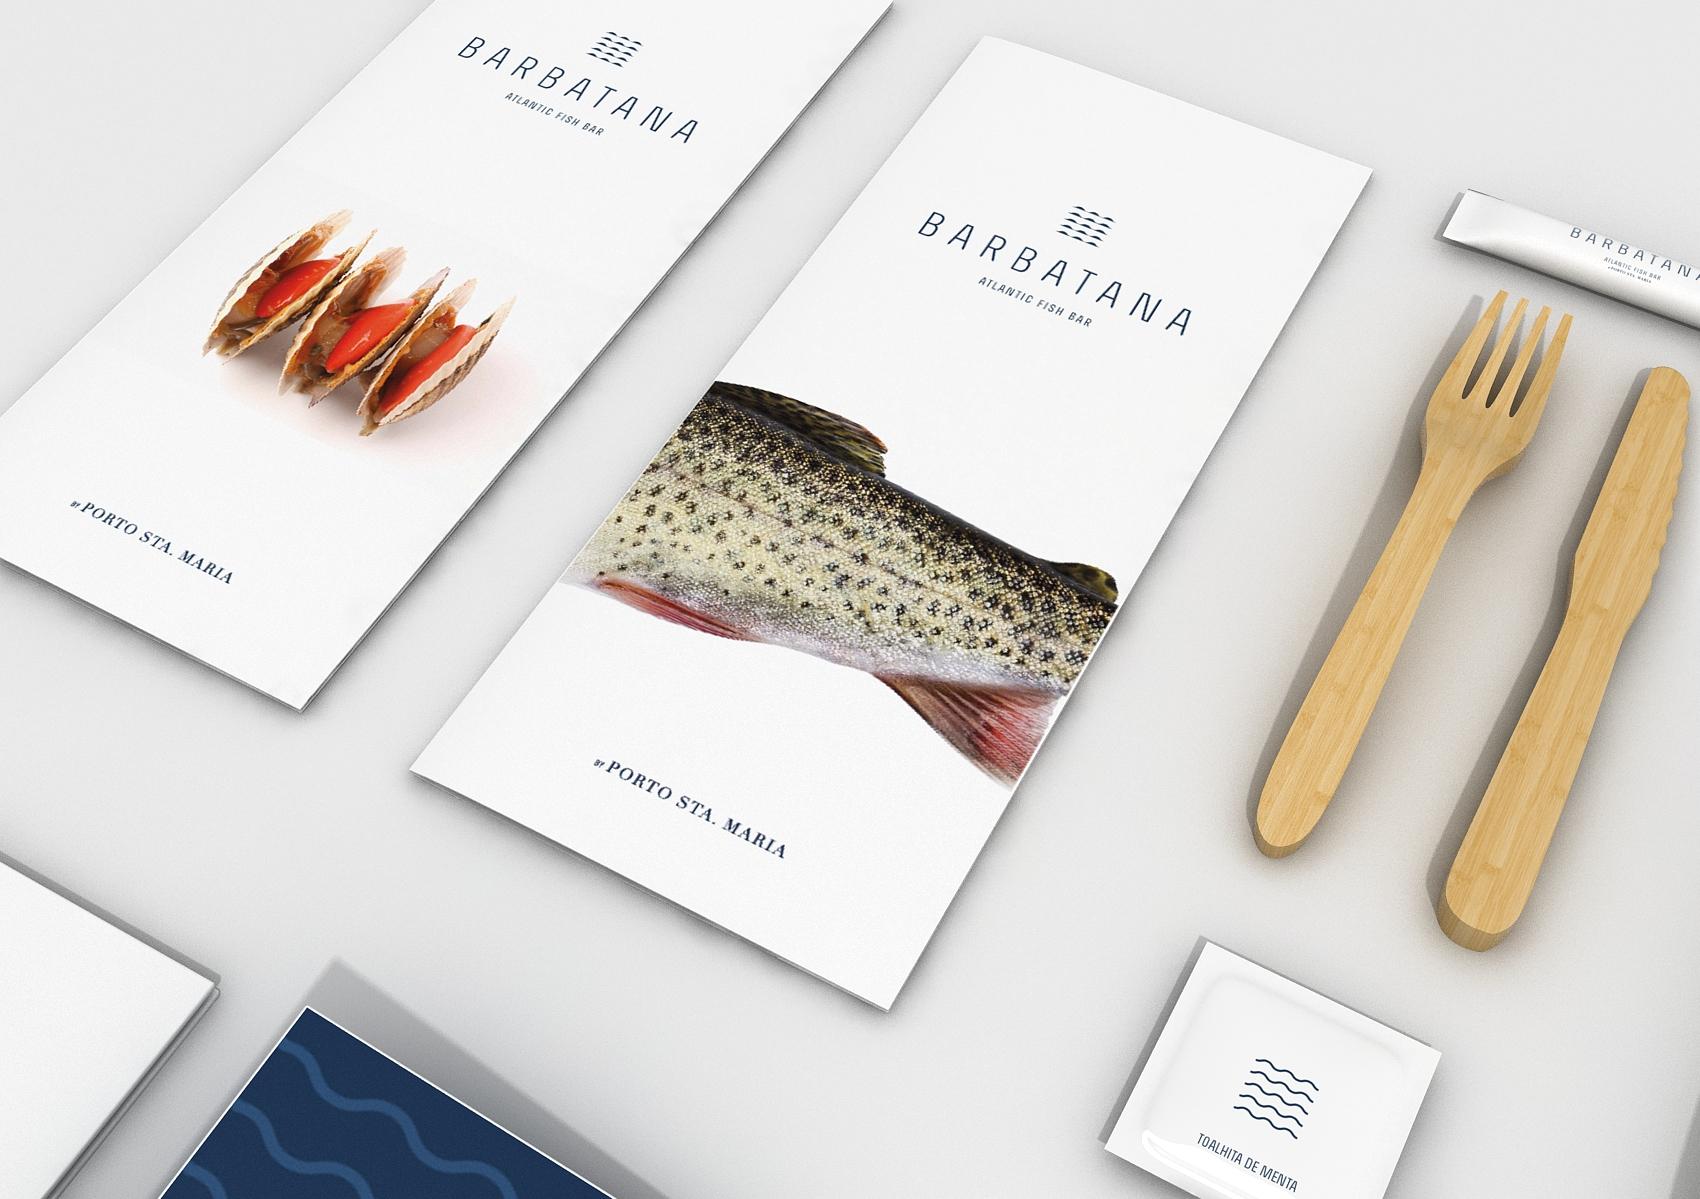 Barbatana restaurant brand menus